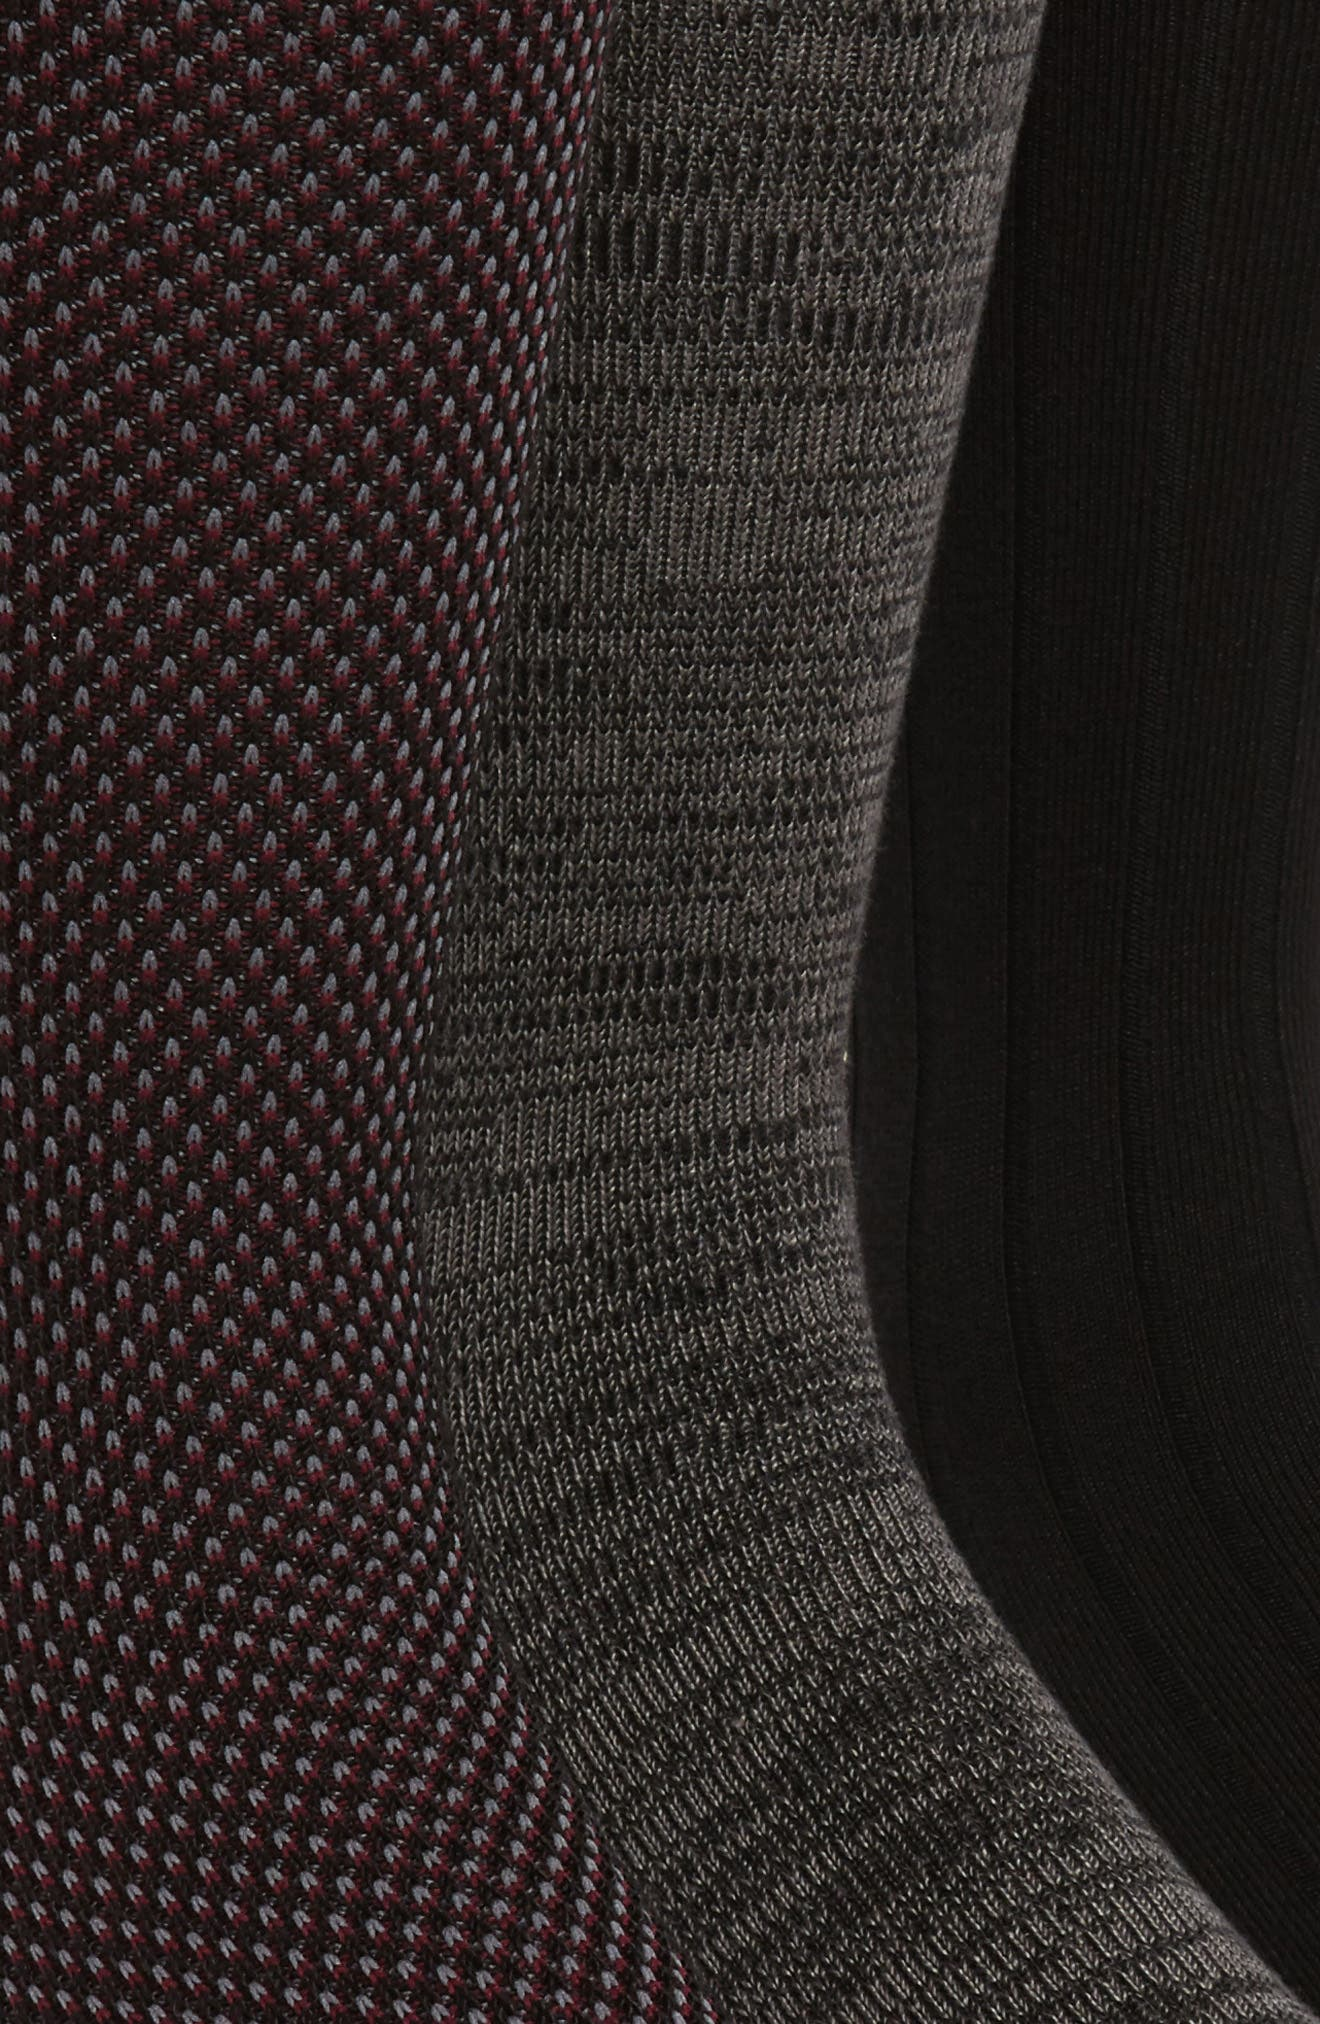 Supersoft Bird's Eye Assorted 3-Pack Socks,                             Alternate thumbnail 2, color,                             Black